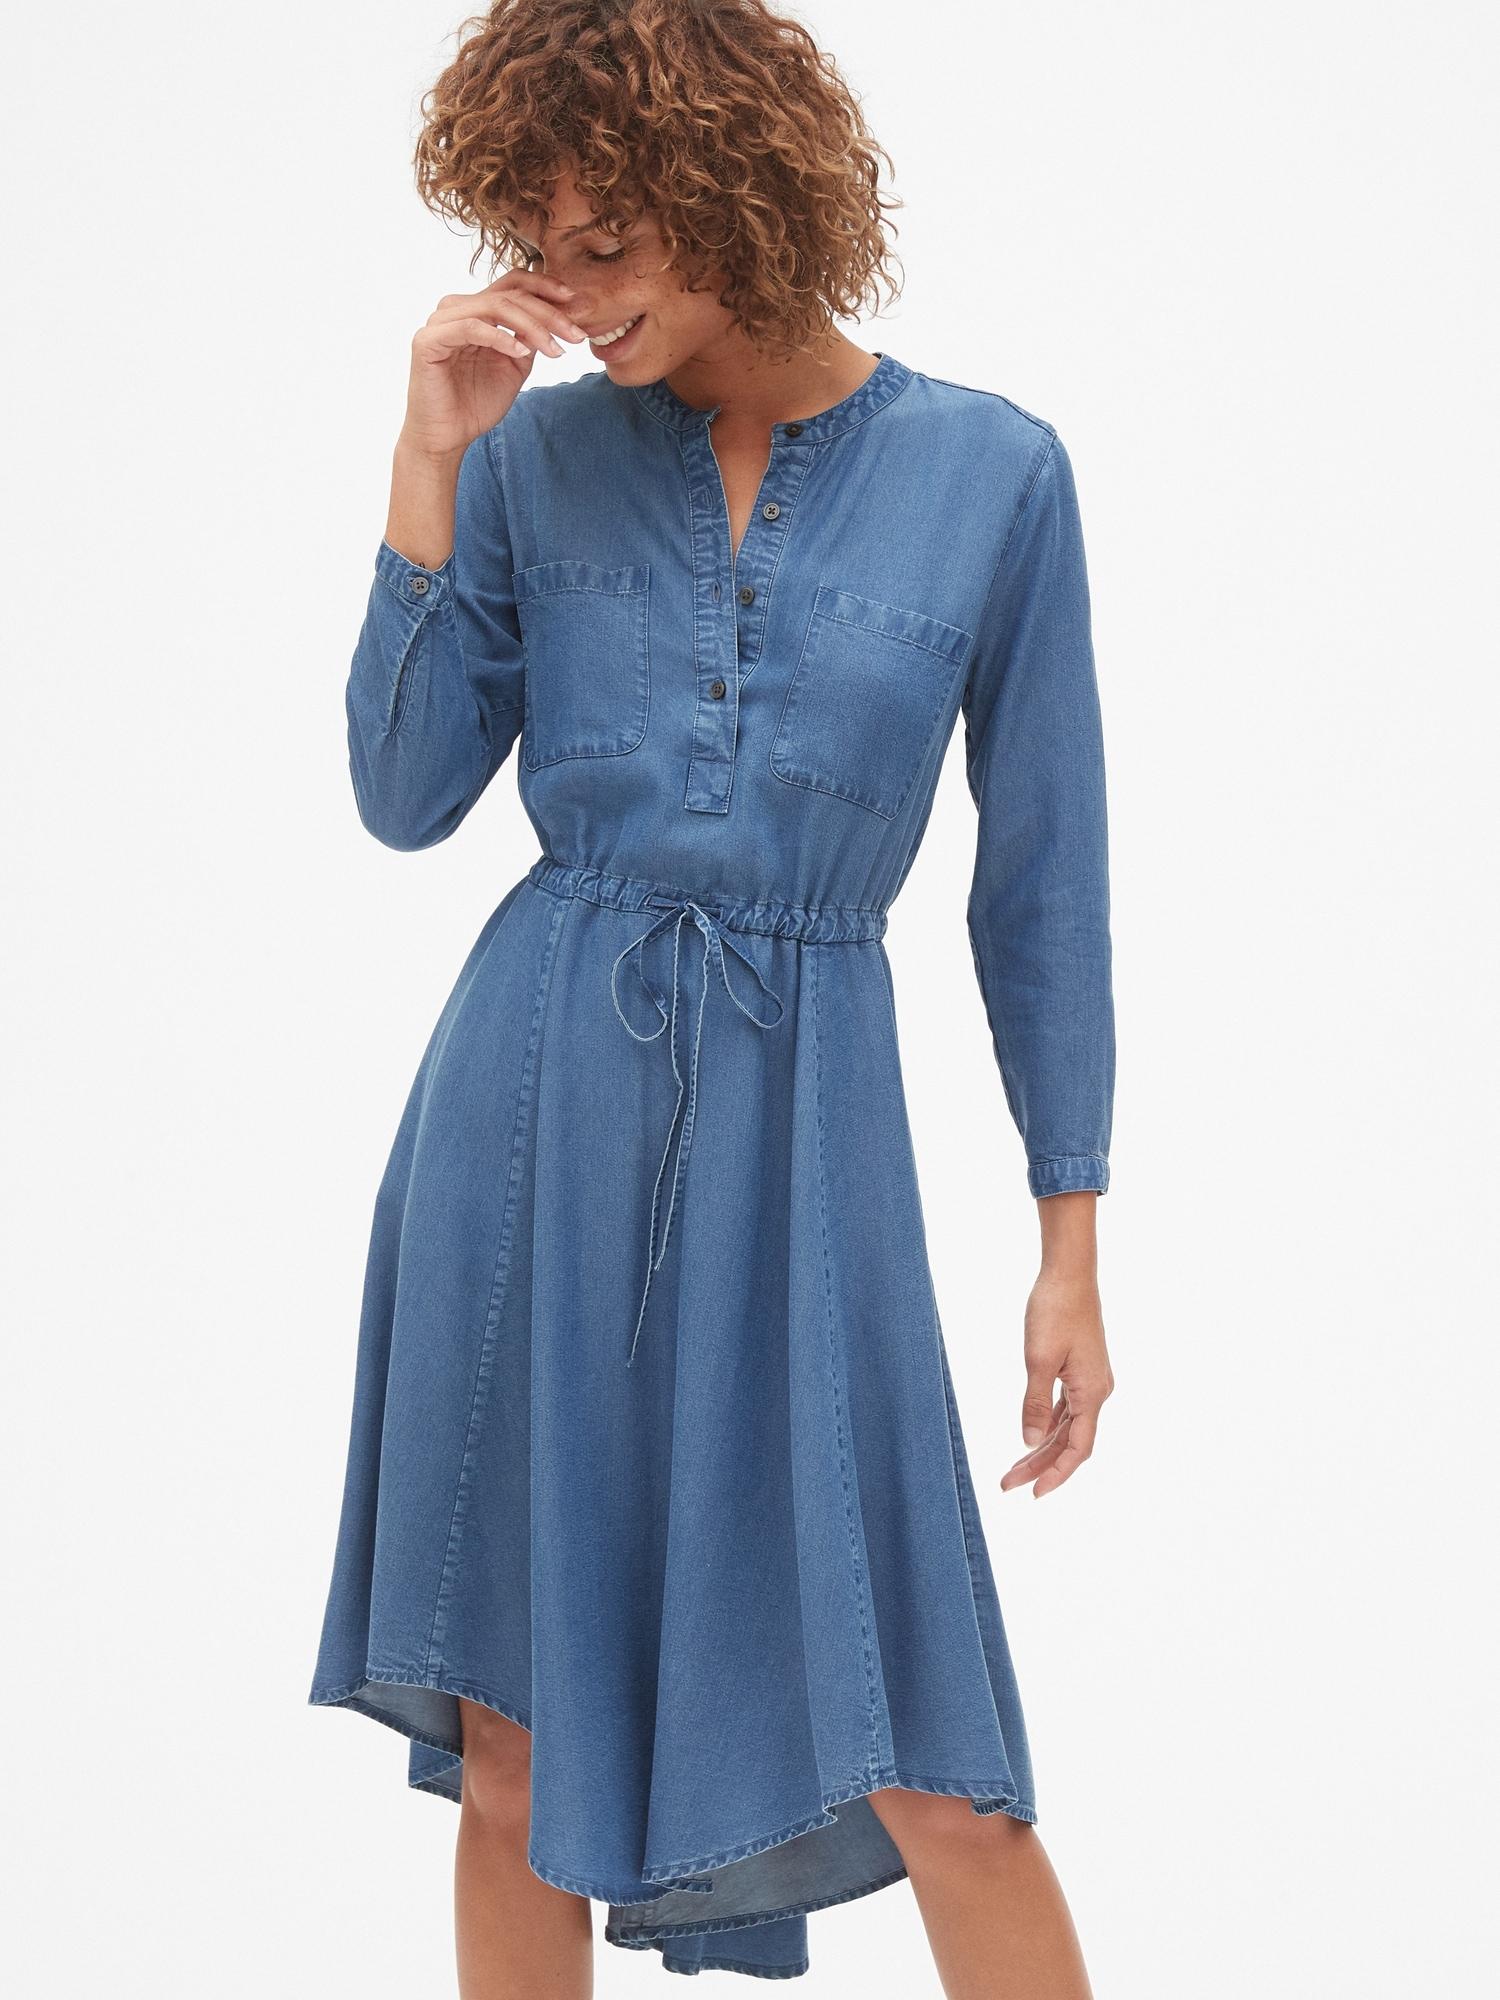 5e33e2b8469 Perfect Long Sleeve Tie-Waist Shirtdress in TENCEL™